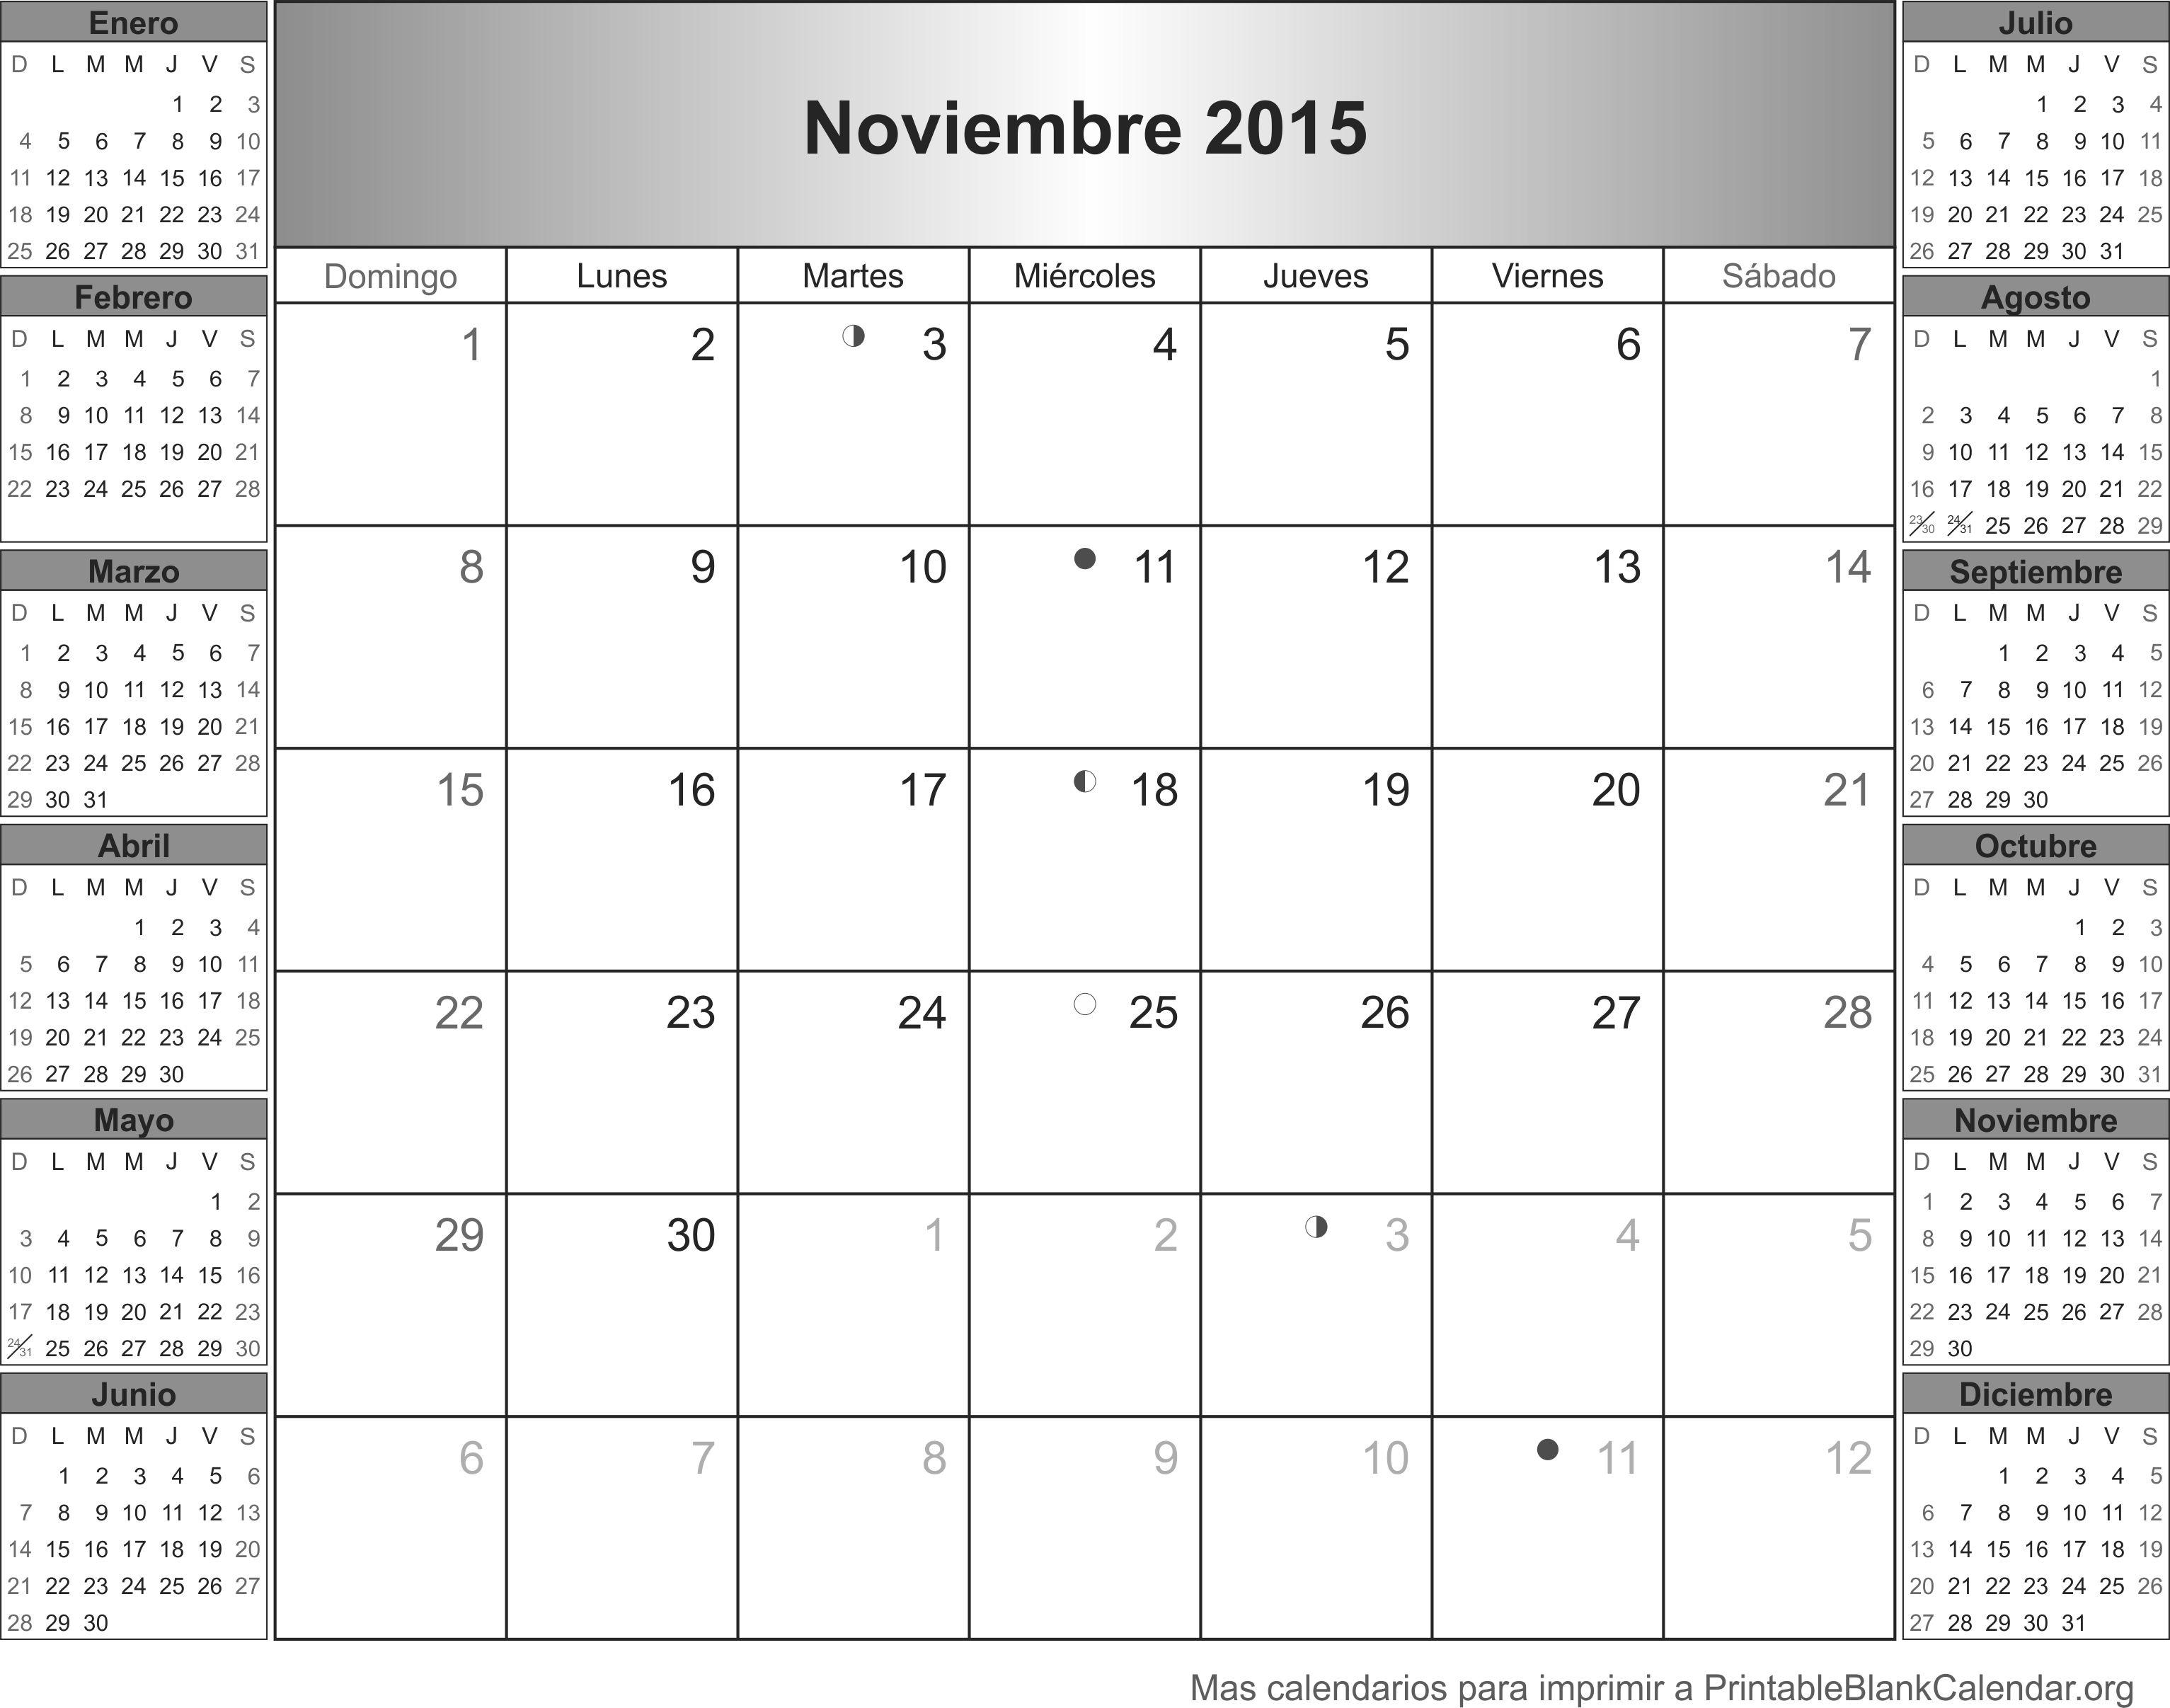 Imprimir calendario Noviembre 2015